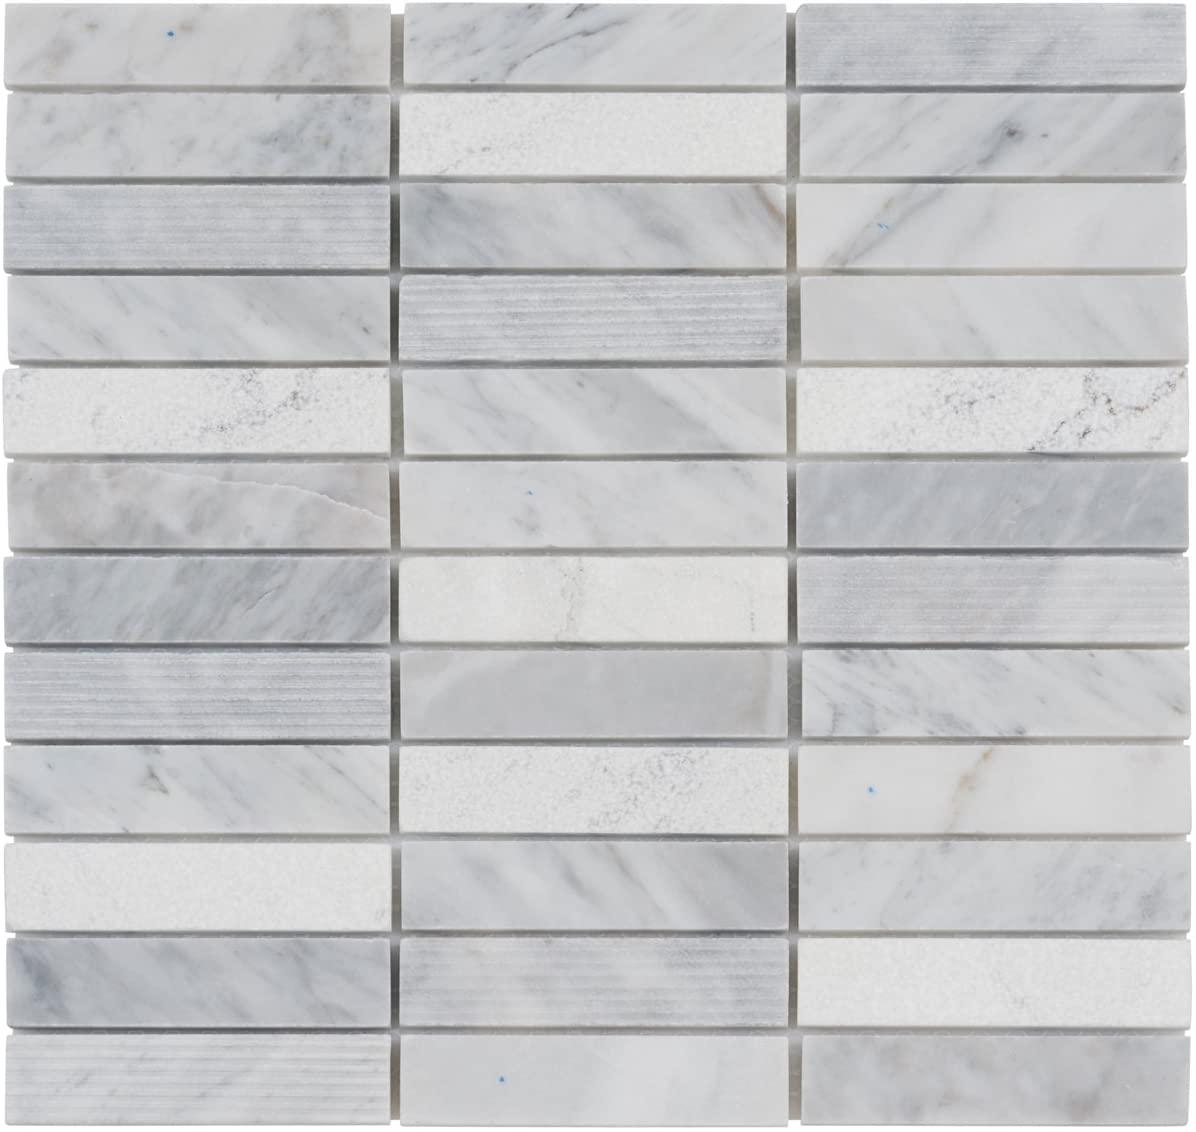 Modket TDH54MO White Carrara Marble Stone Mosaic Tile, Texture Blend Stacked Pattern Backsplash